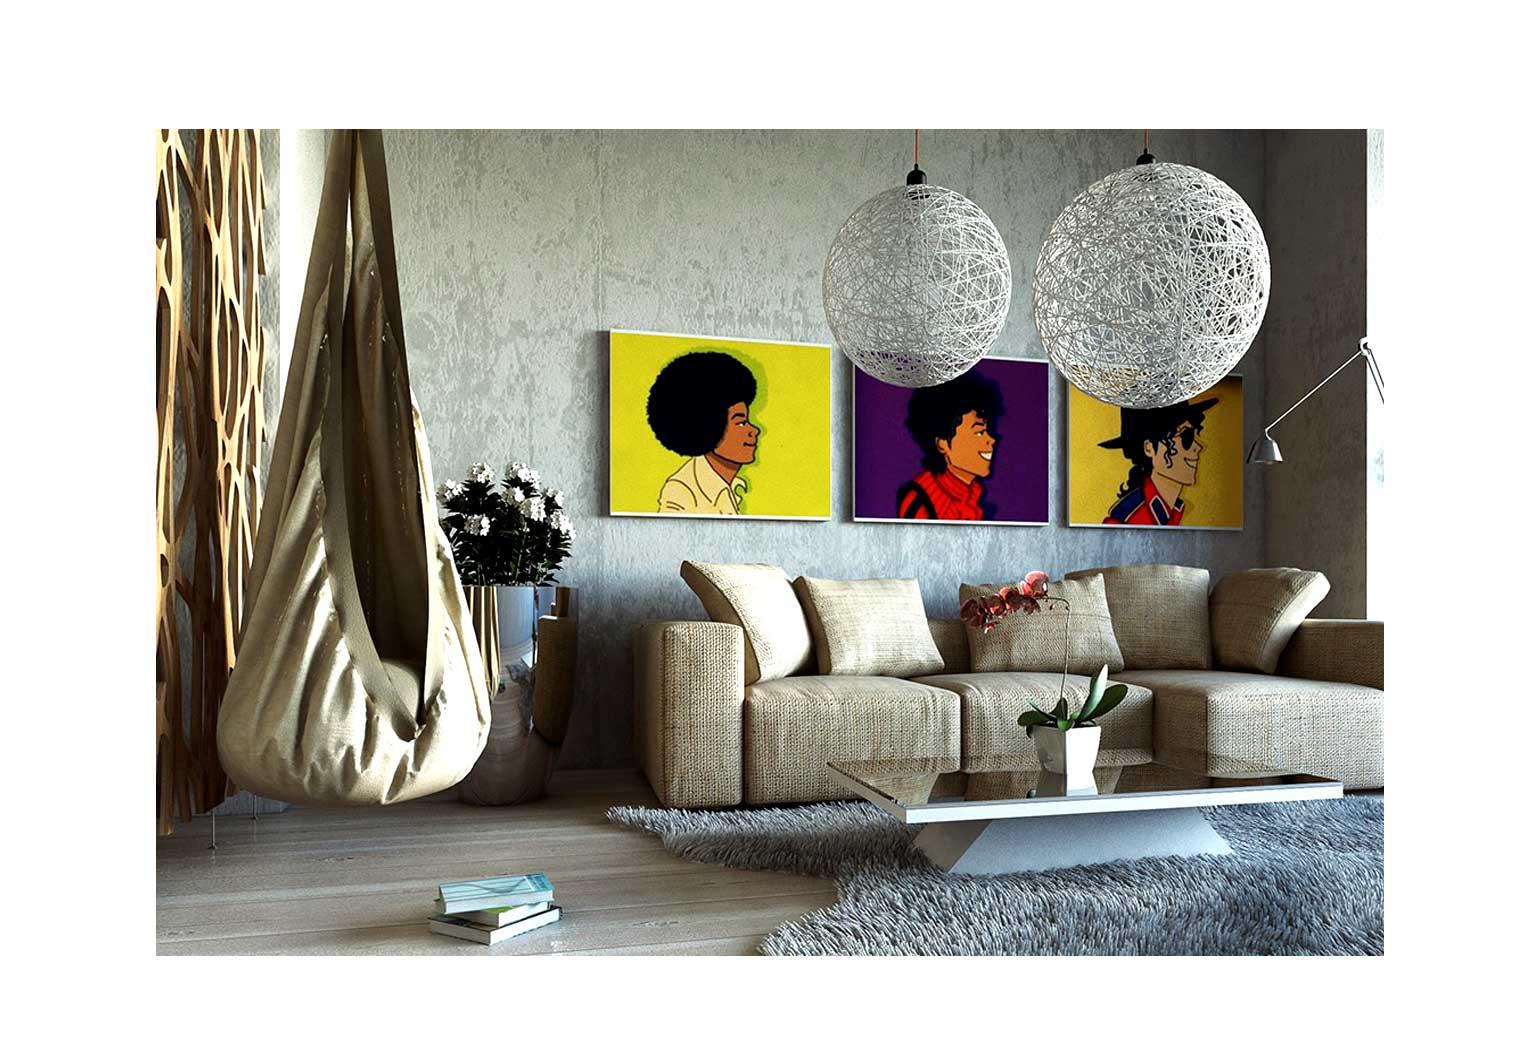 Design An Art centric Room33 - چگونه یک اتاق هنری را طراحی کنیم؟